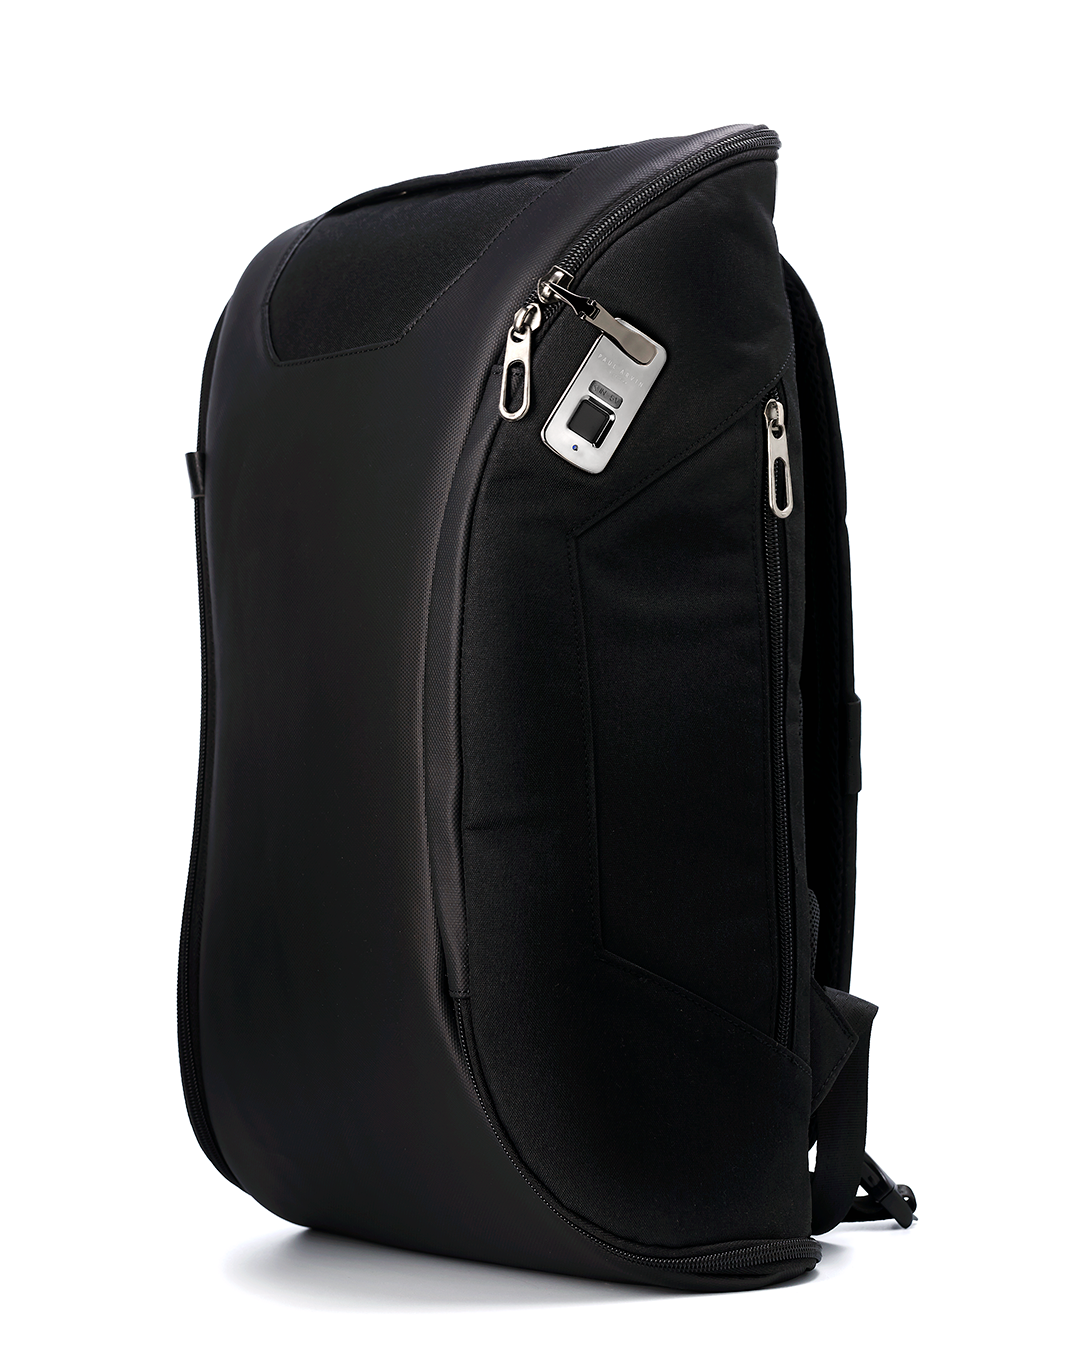 mochilas-paul-arvin-backpacks-sr-erreka-photographer-commercial-editorial-catalog-ecommerce-photography-publicidad-catalogo-online-store-branded-content-fotografo-costa-del-sol-benalmadena-spain-malaga.png